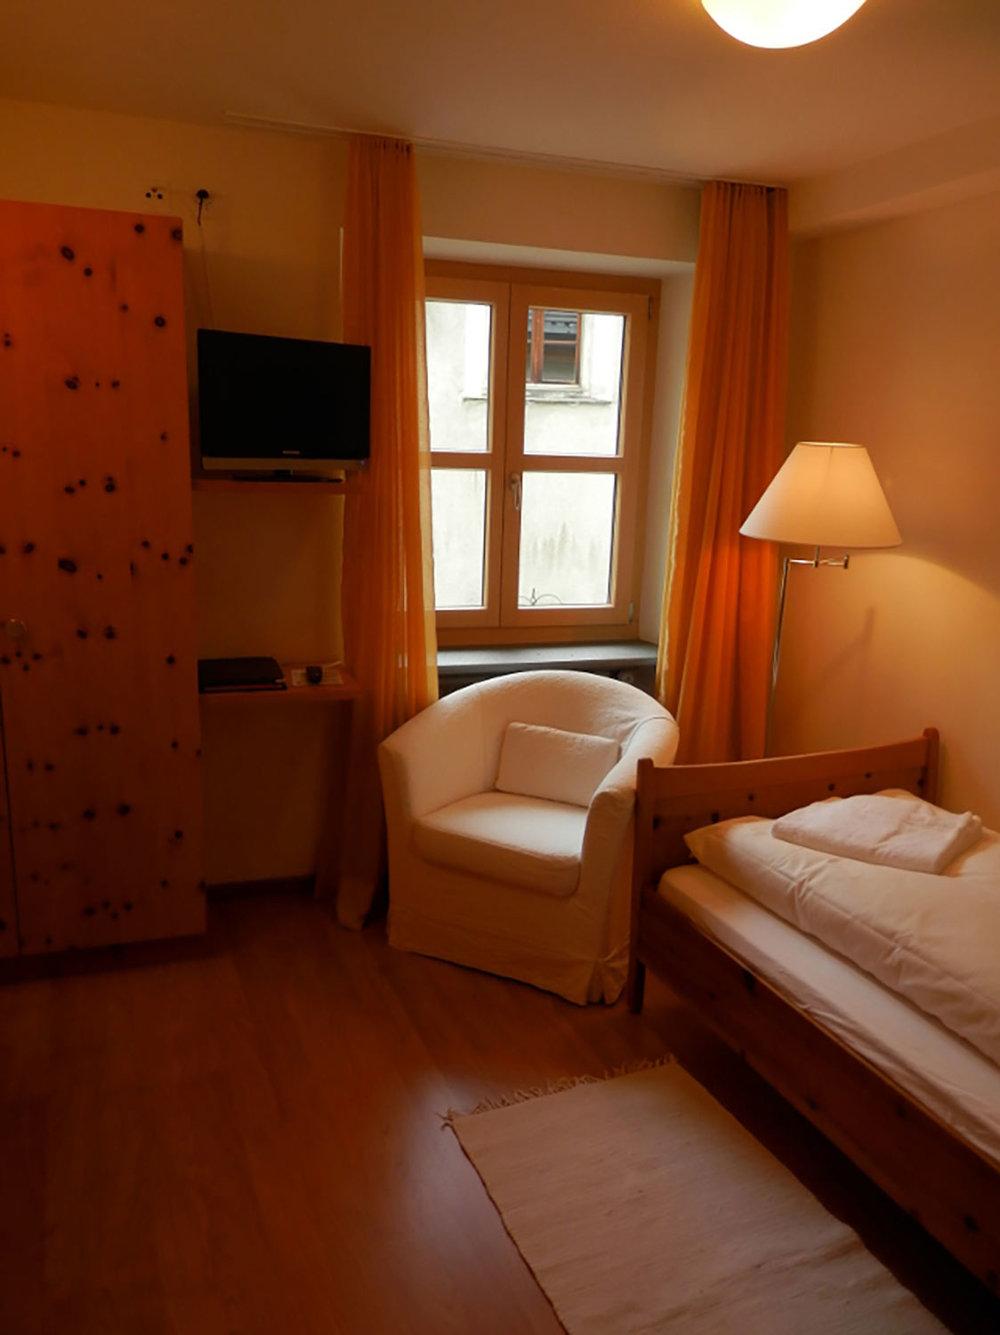 Wohneinheit-3-Personen-Hotel-Plazzo-Mysanus-4.jpg